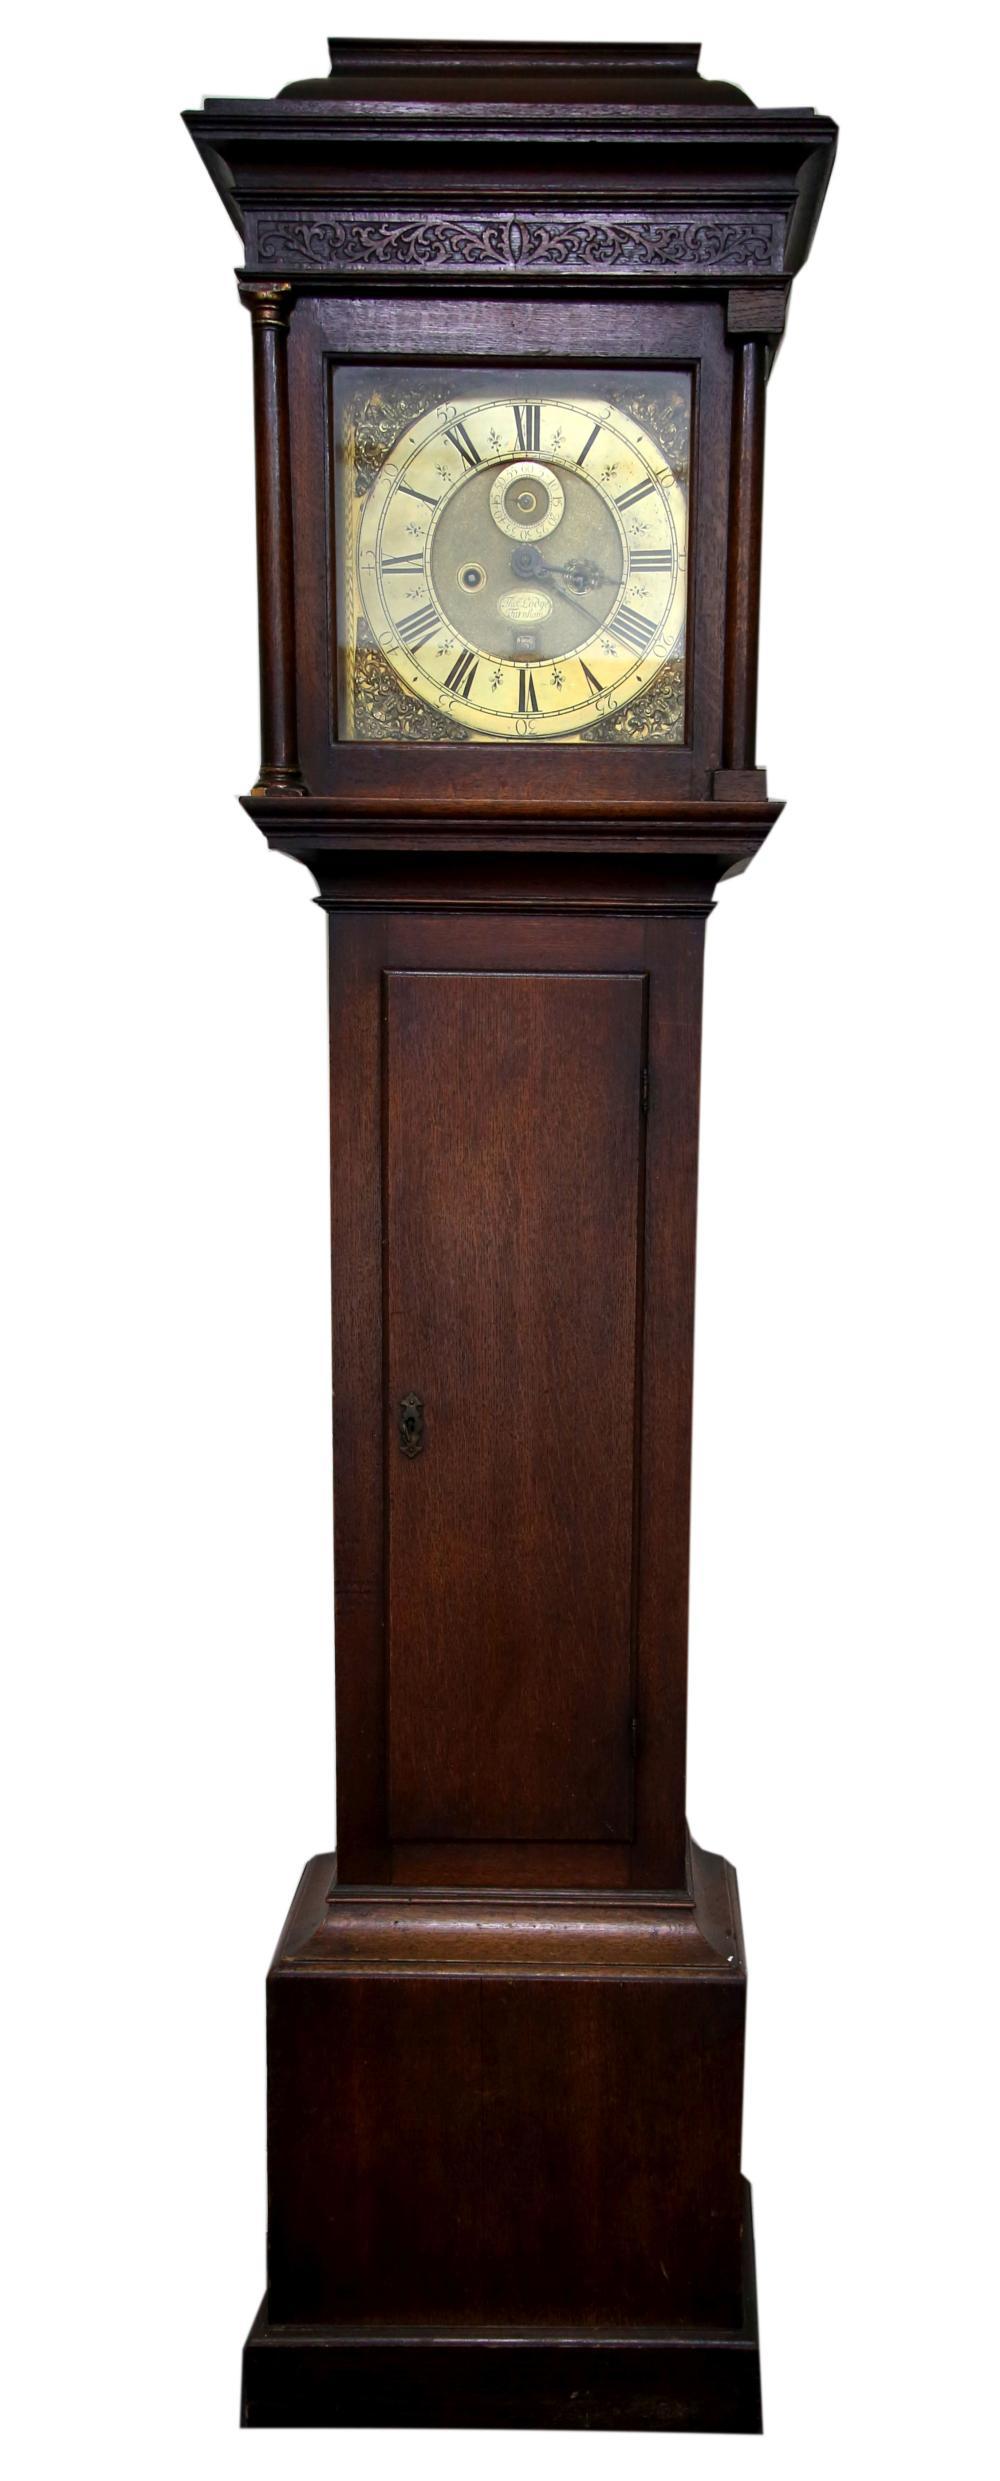 18th century oak eight day  long case clock by Tom